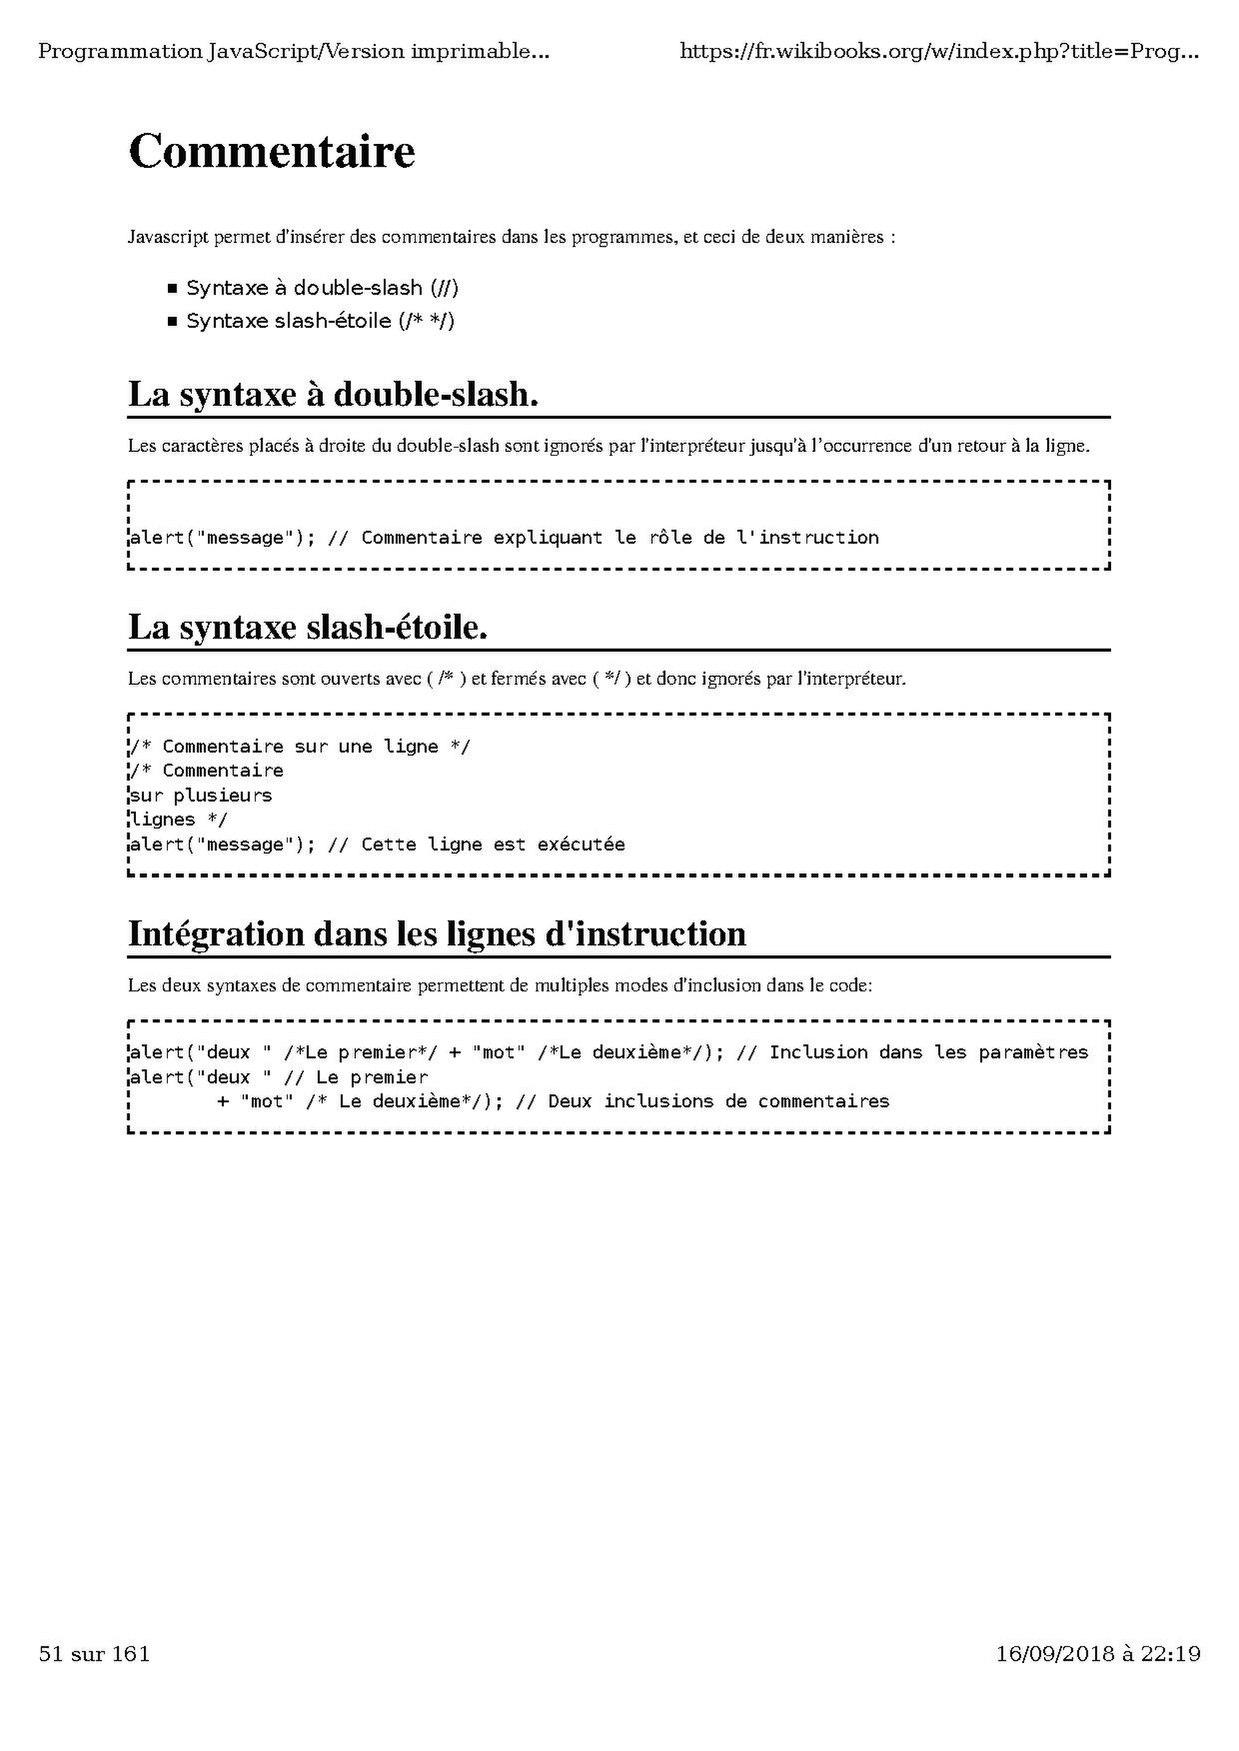 Fichierprogrammation Javascript Frpdf Wikilivres